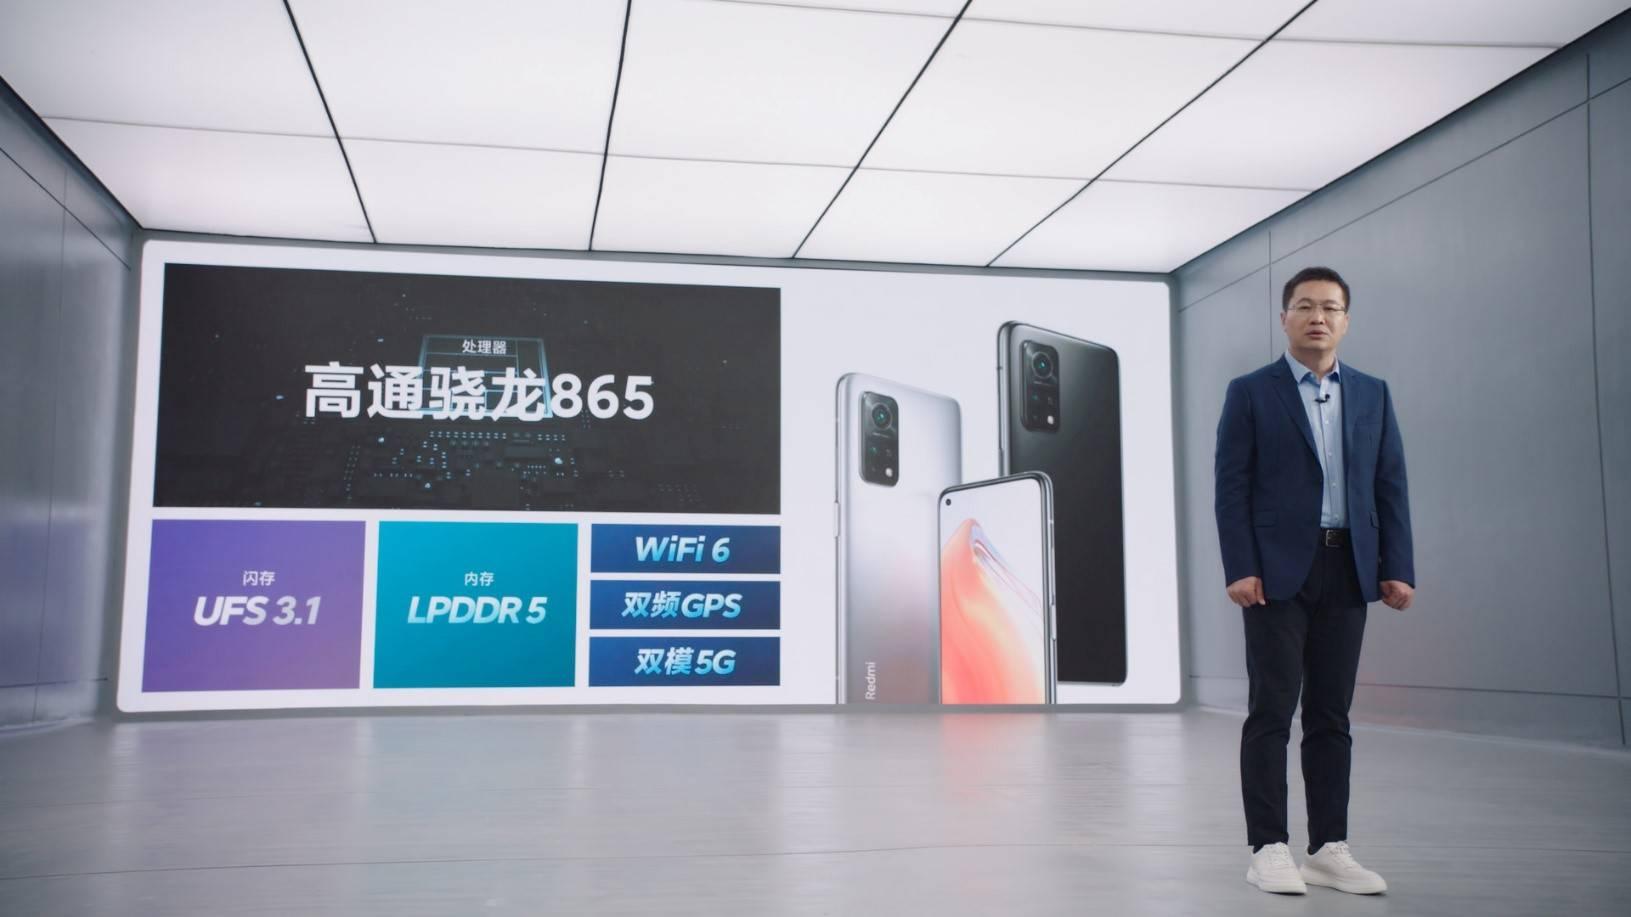 Redmi K30S 至尊纪念版发布:2299元起,双十一利器